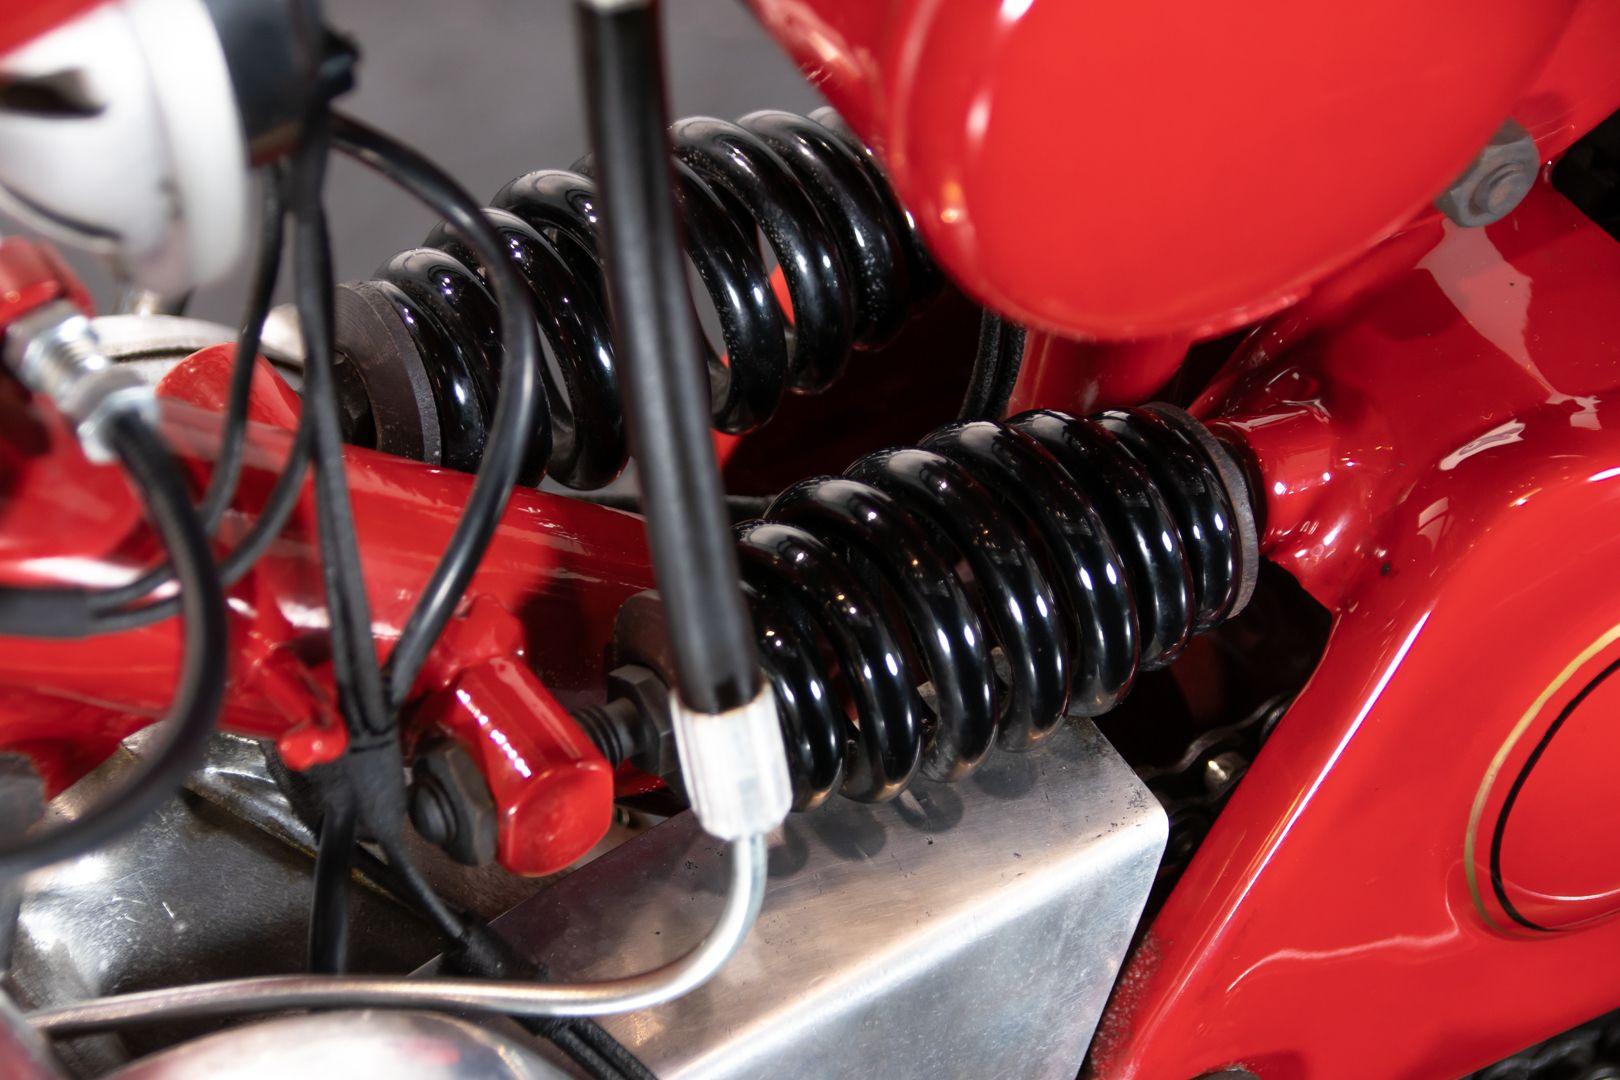 1952 Moto Guzzi 65 59393